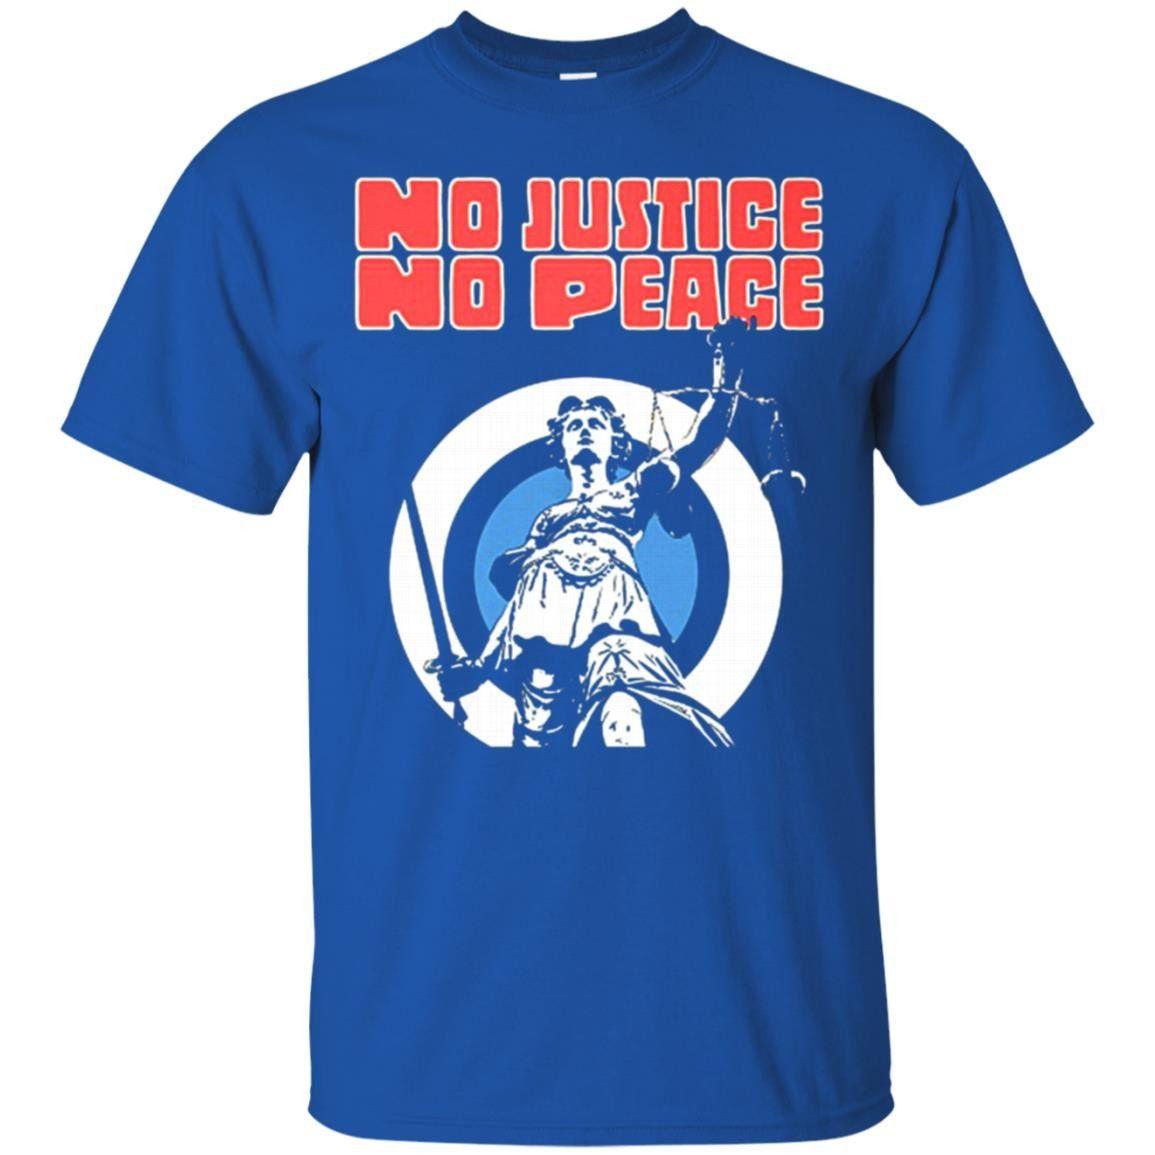 No Justice No Peace Shirts Women Right Women March Feminish T shirts Hoodies Sweatshirts